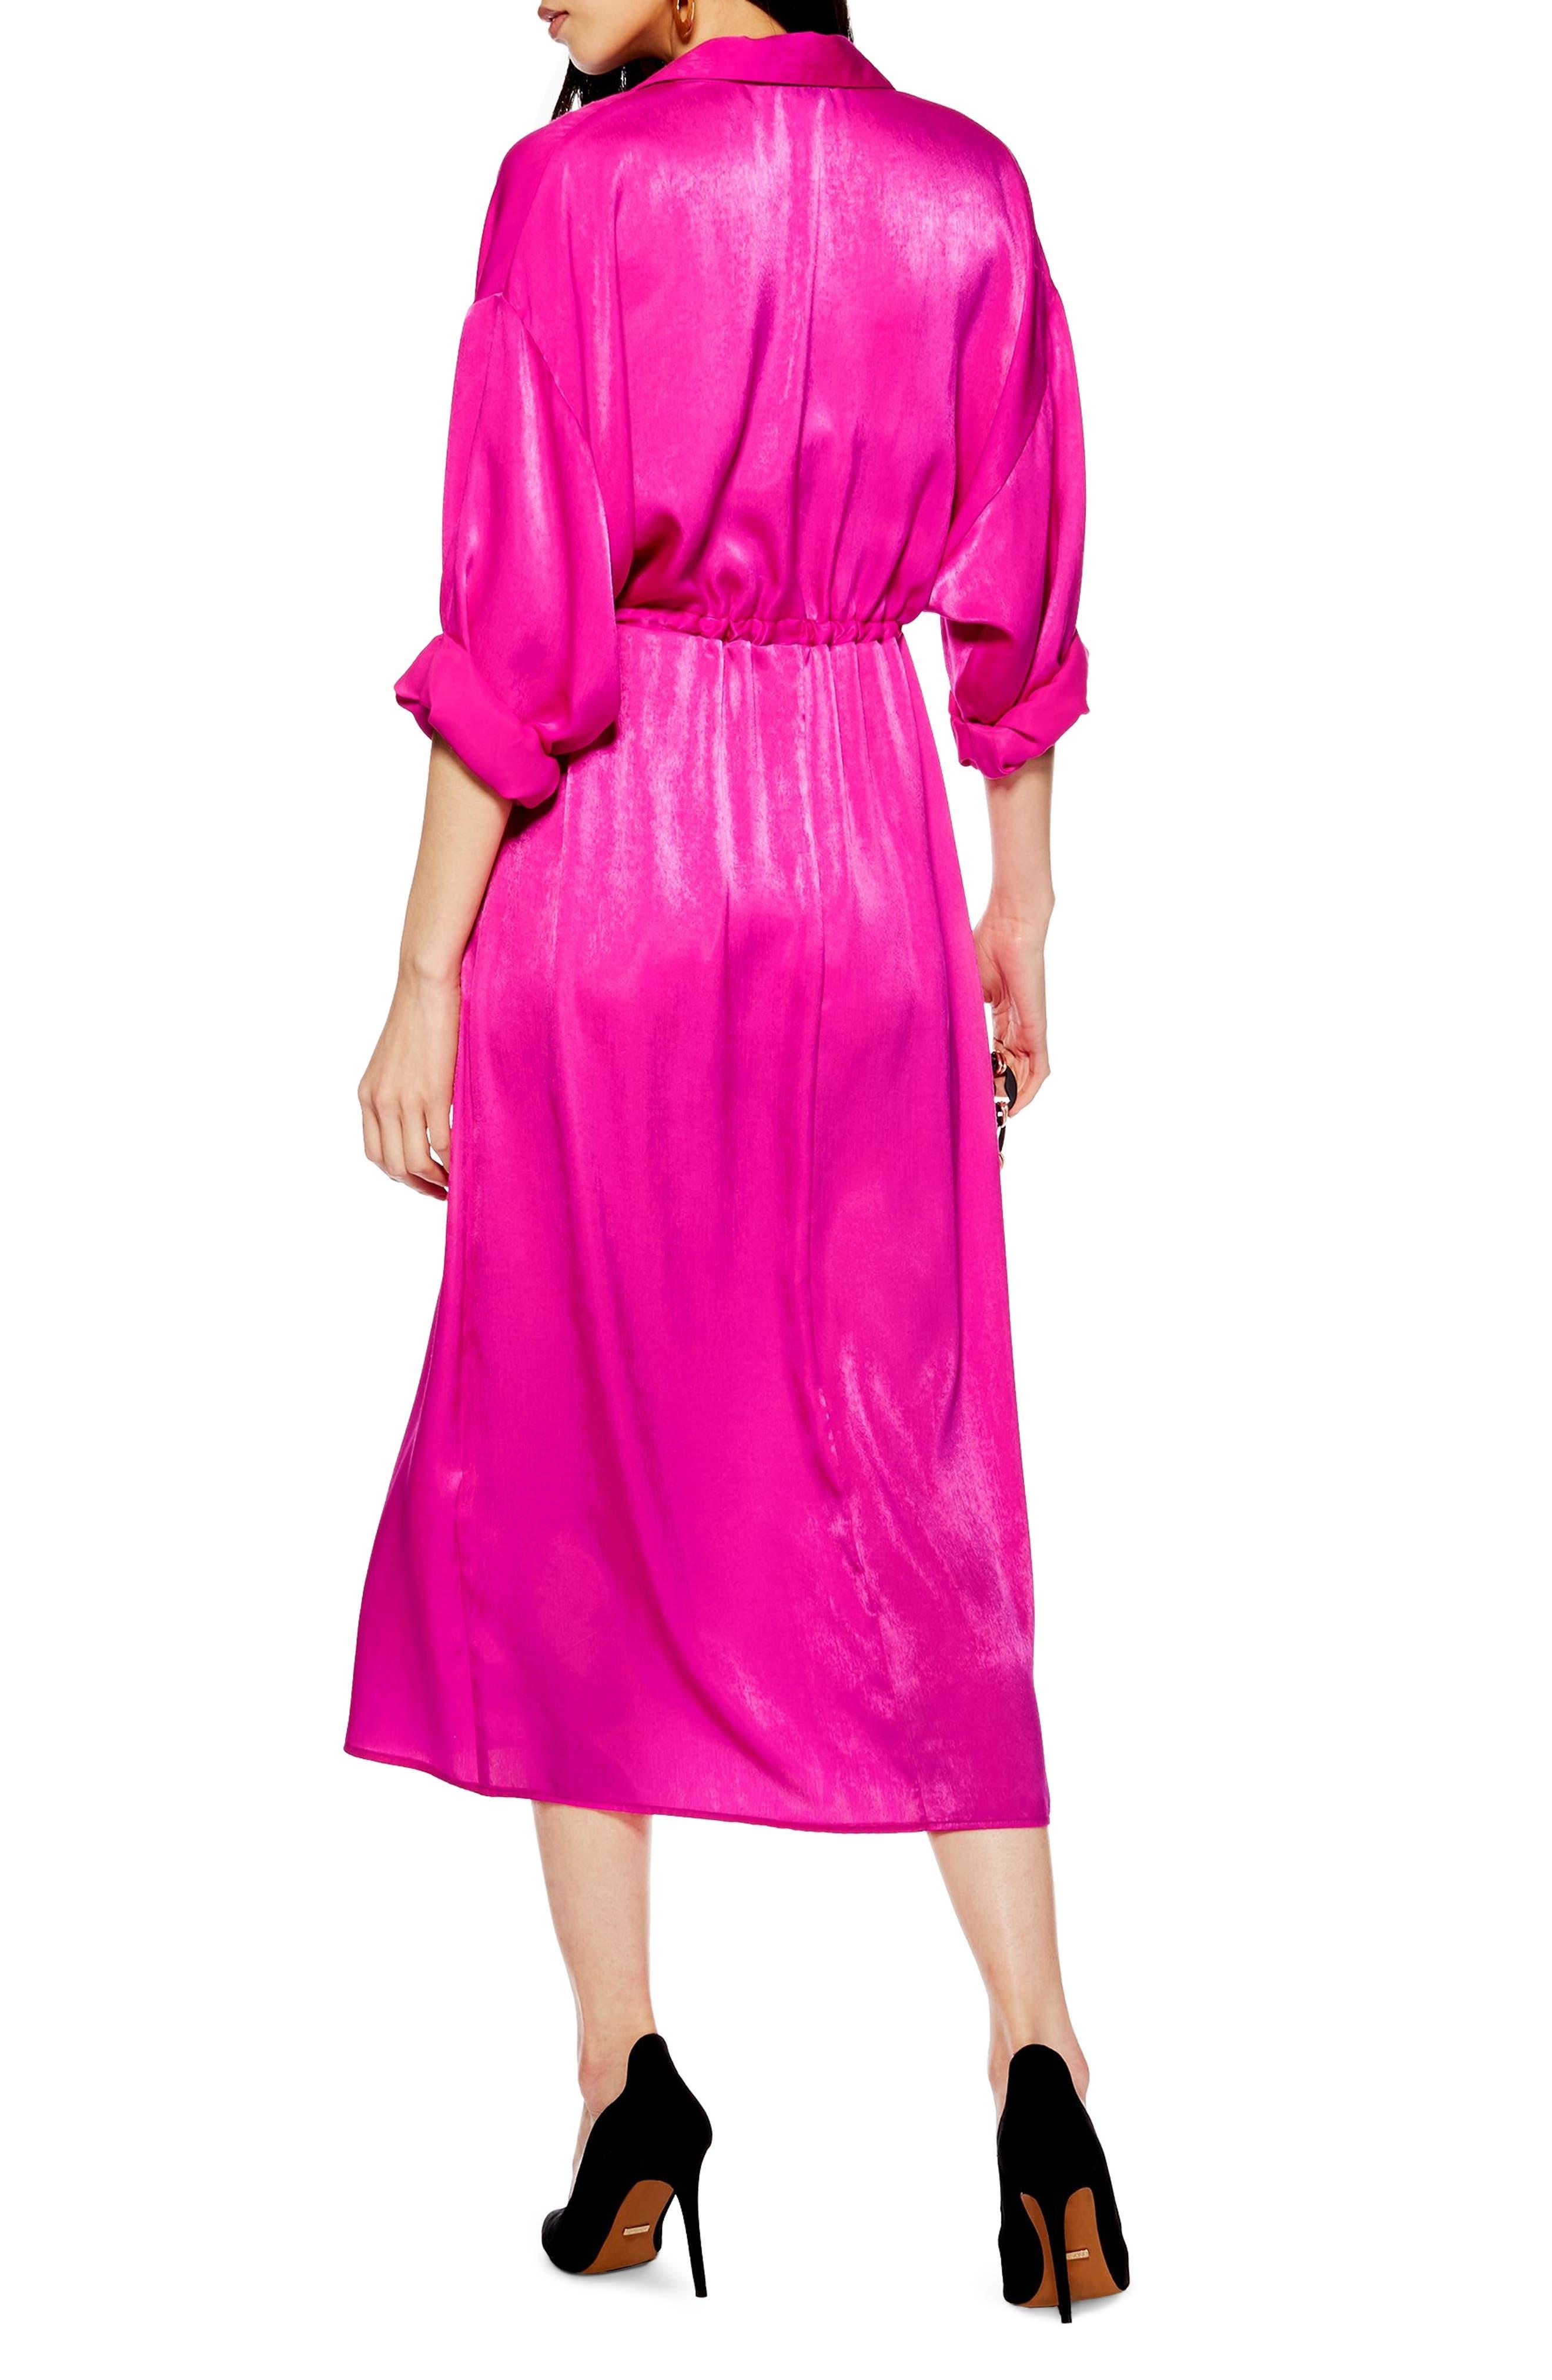 TOPSHOP,                             Satin Midi Shirtdress,                             Alternate thumbnail 2, color,                             BRIGHT PINK